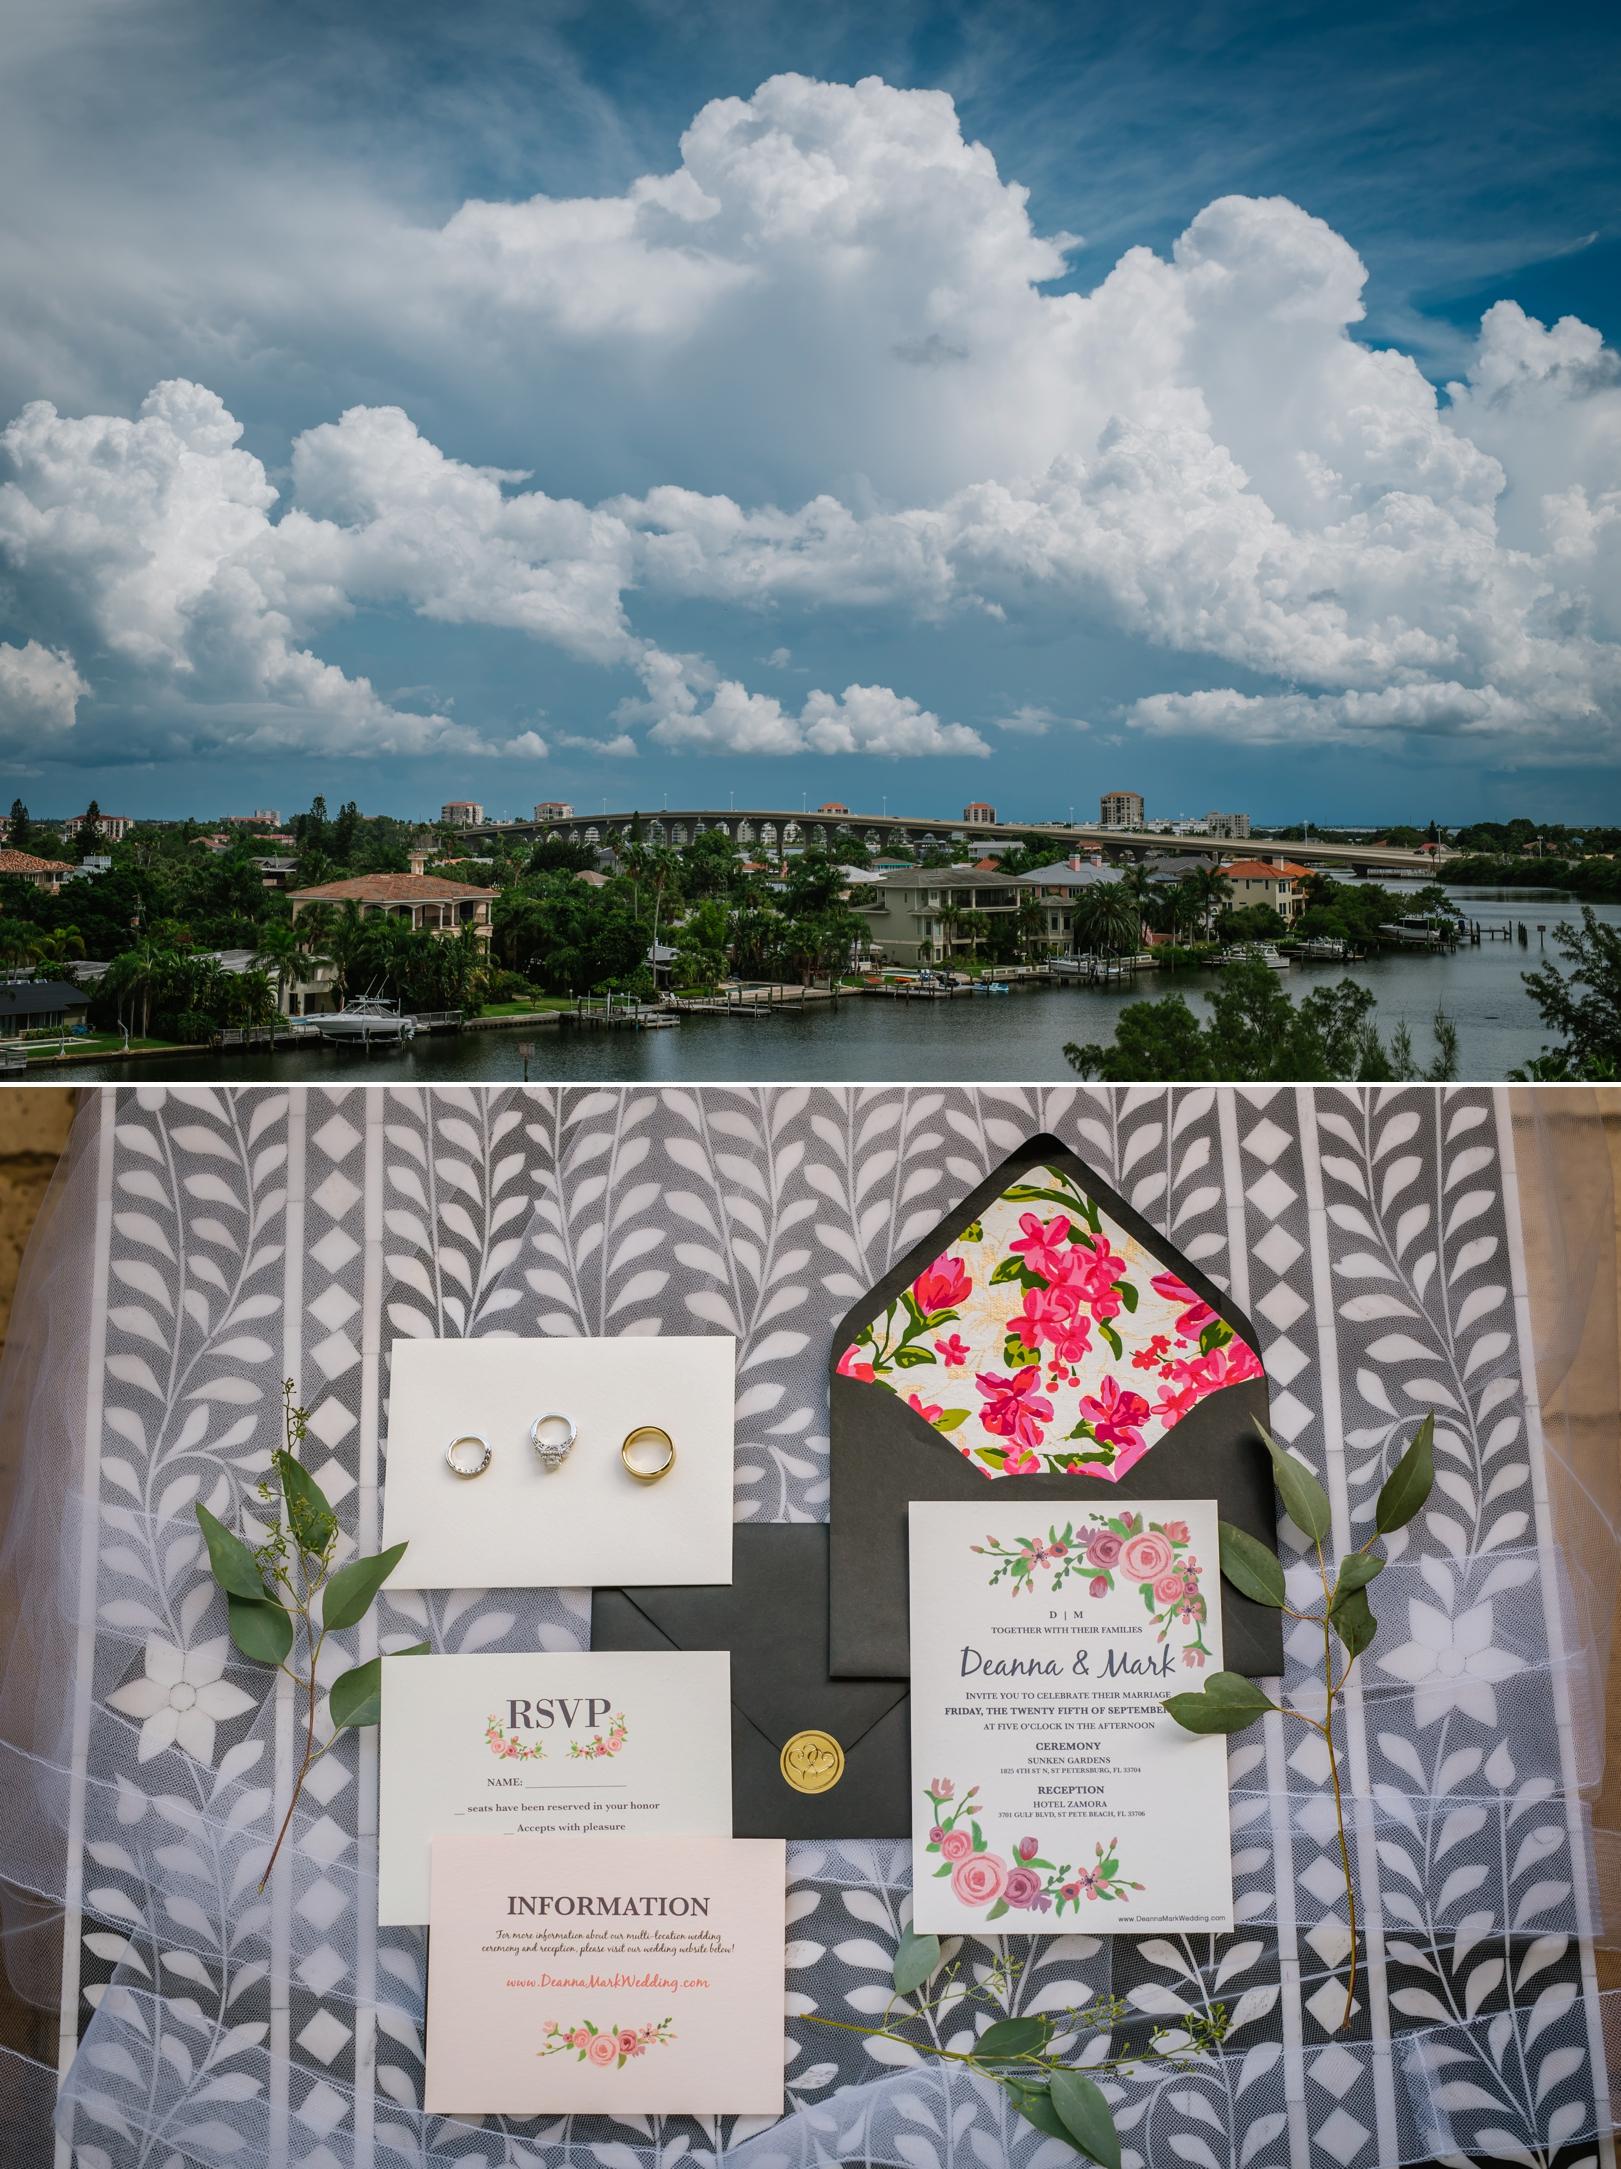 st-pete-hotel-zamora-sunken-gardens-rooftop-wedding-photography_0001.jpg